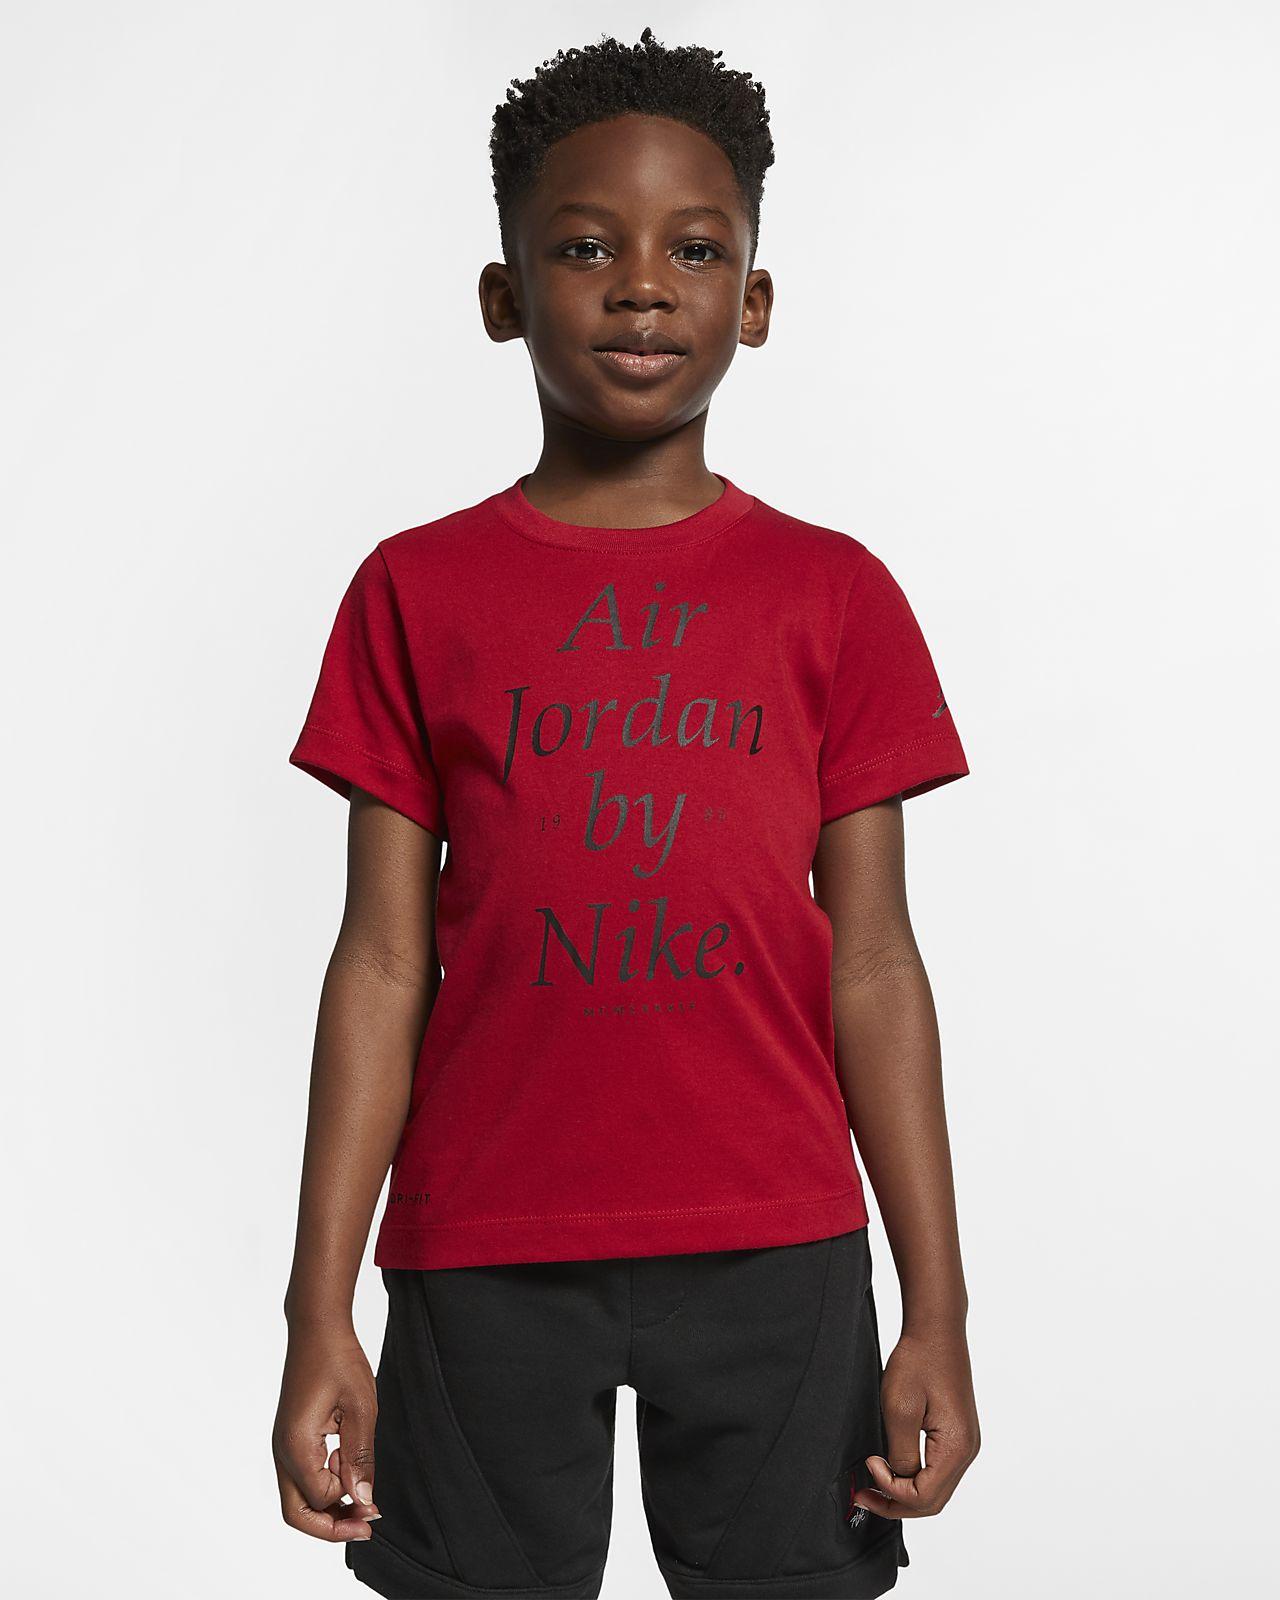 Jordan Sportswear T-Shirt für jüngere Kinder